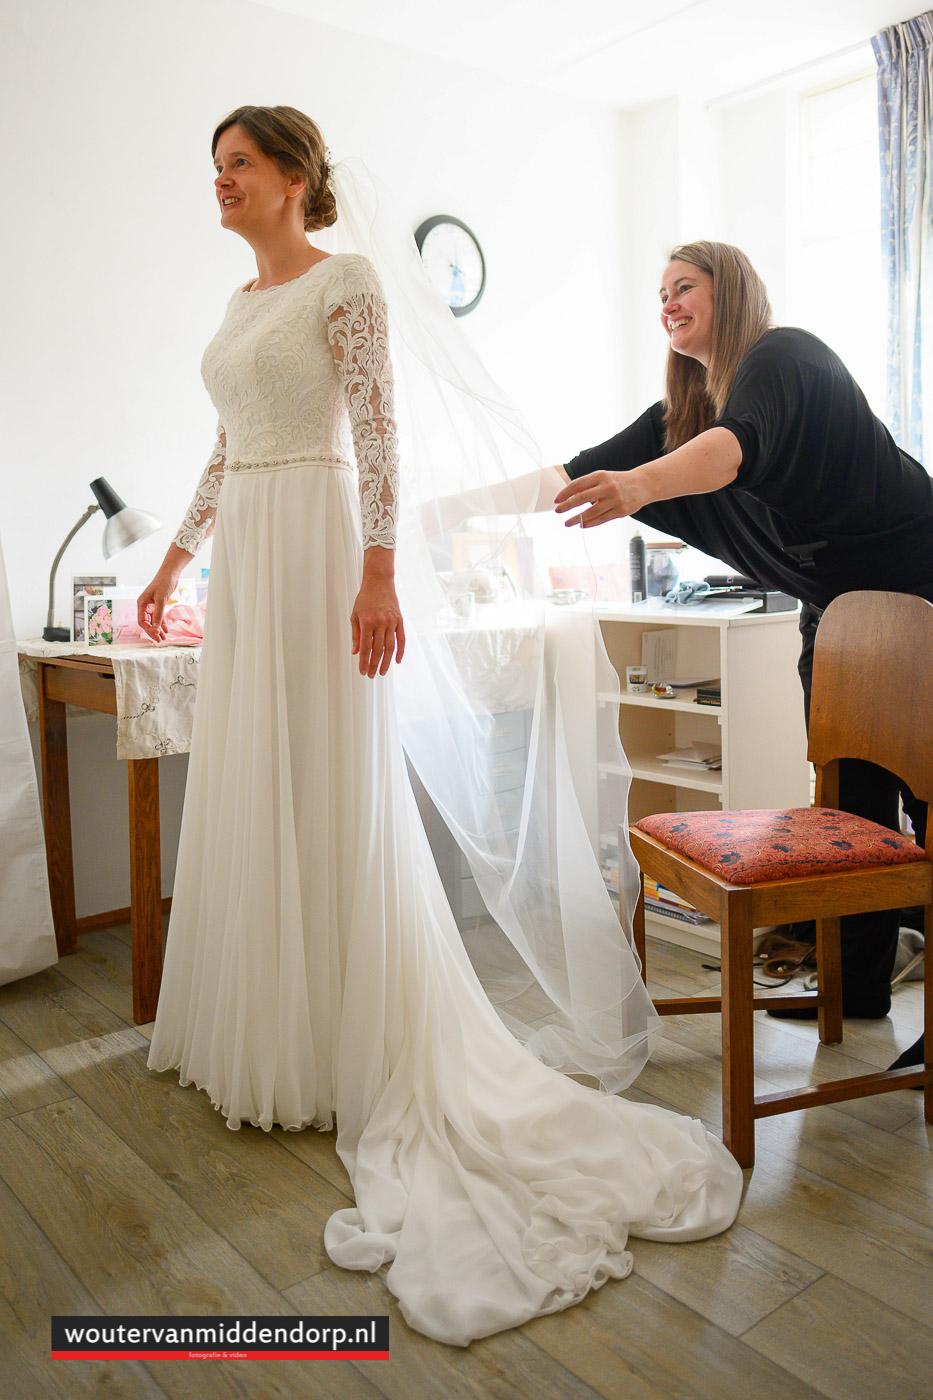 bruidsfotografie Wouter van Middendorp Uddel, Gorinchem, Ridderkerk-10